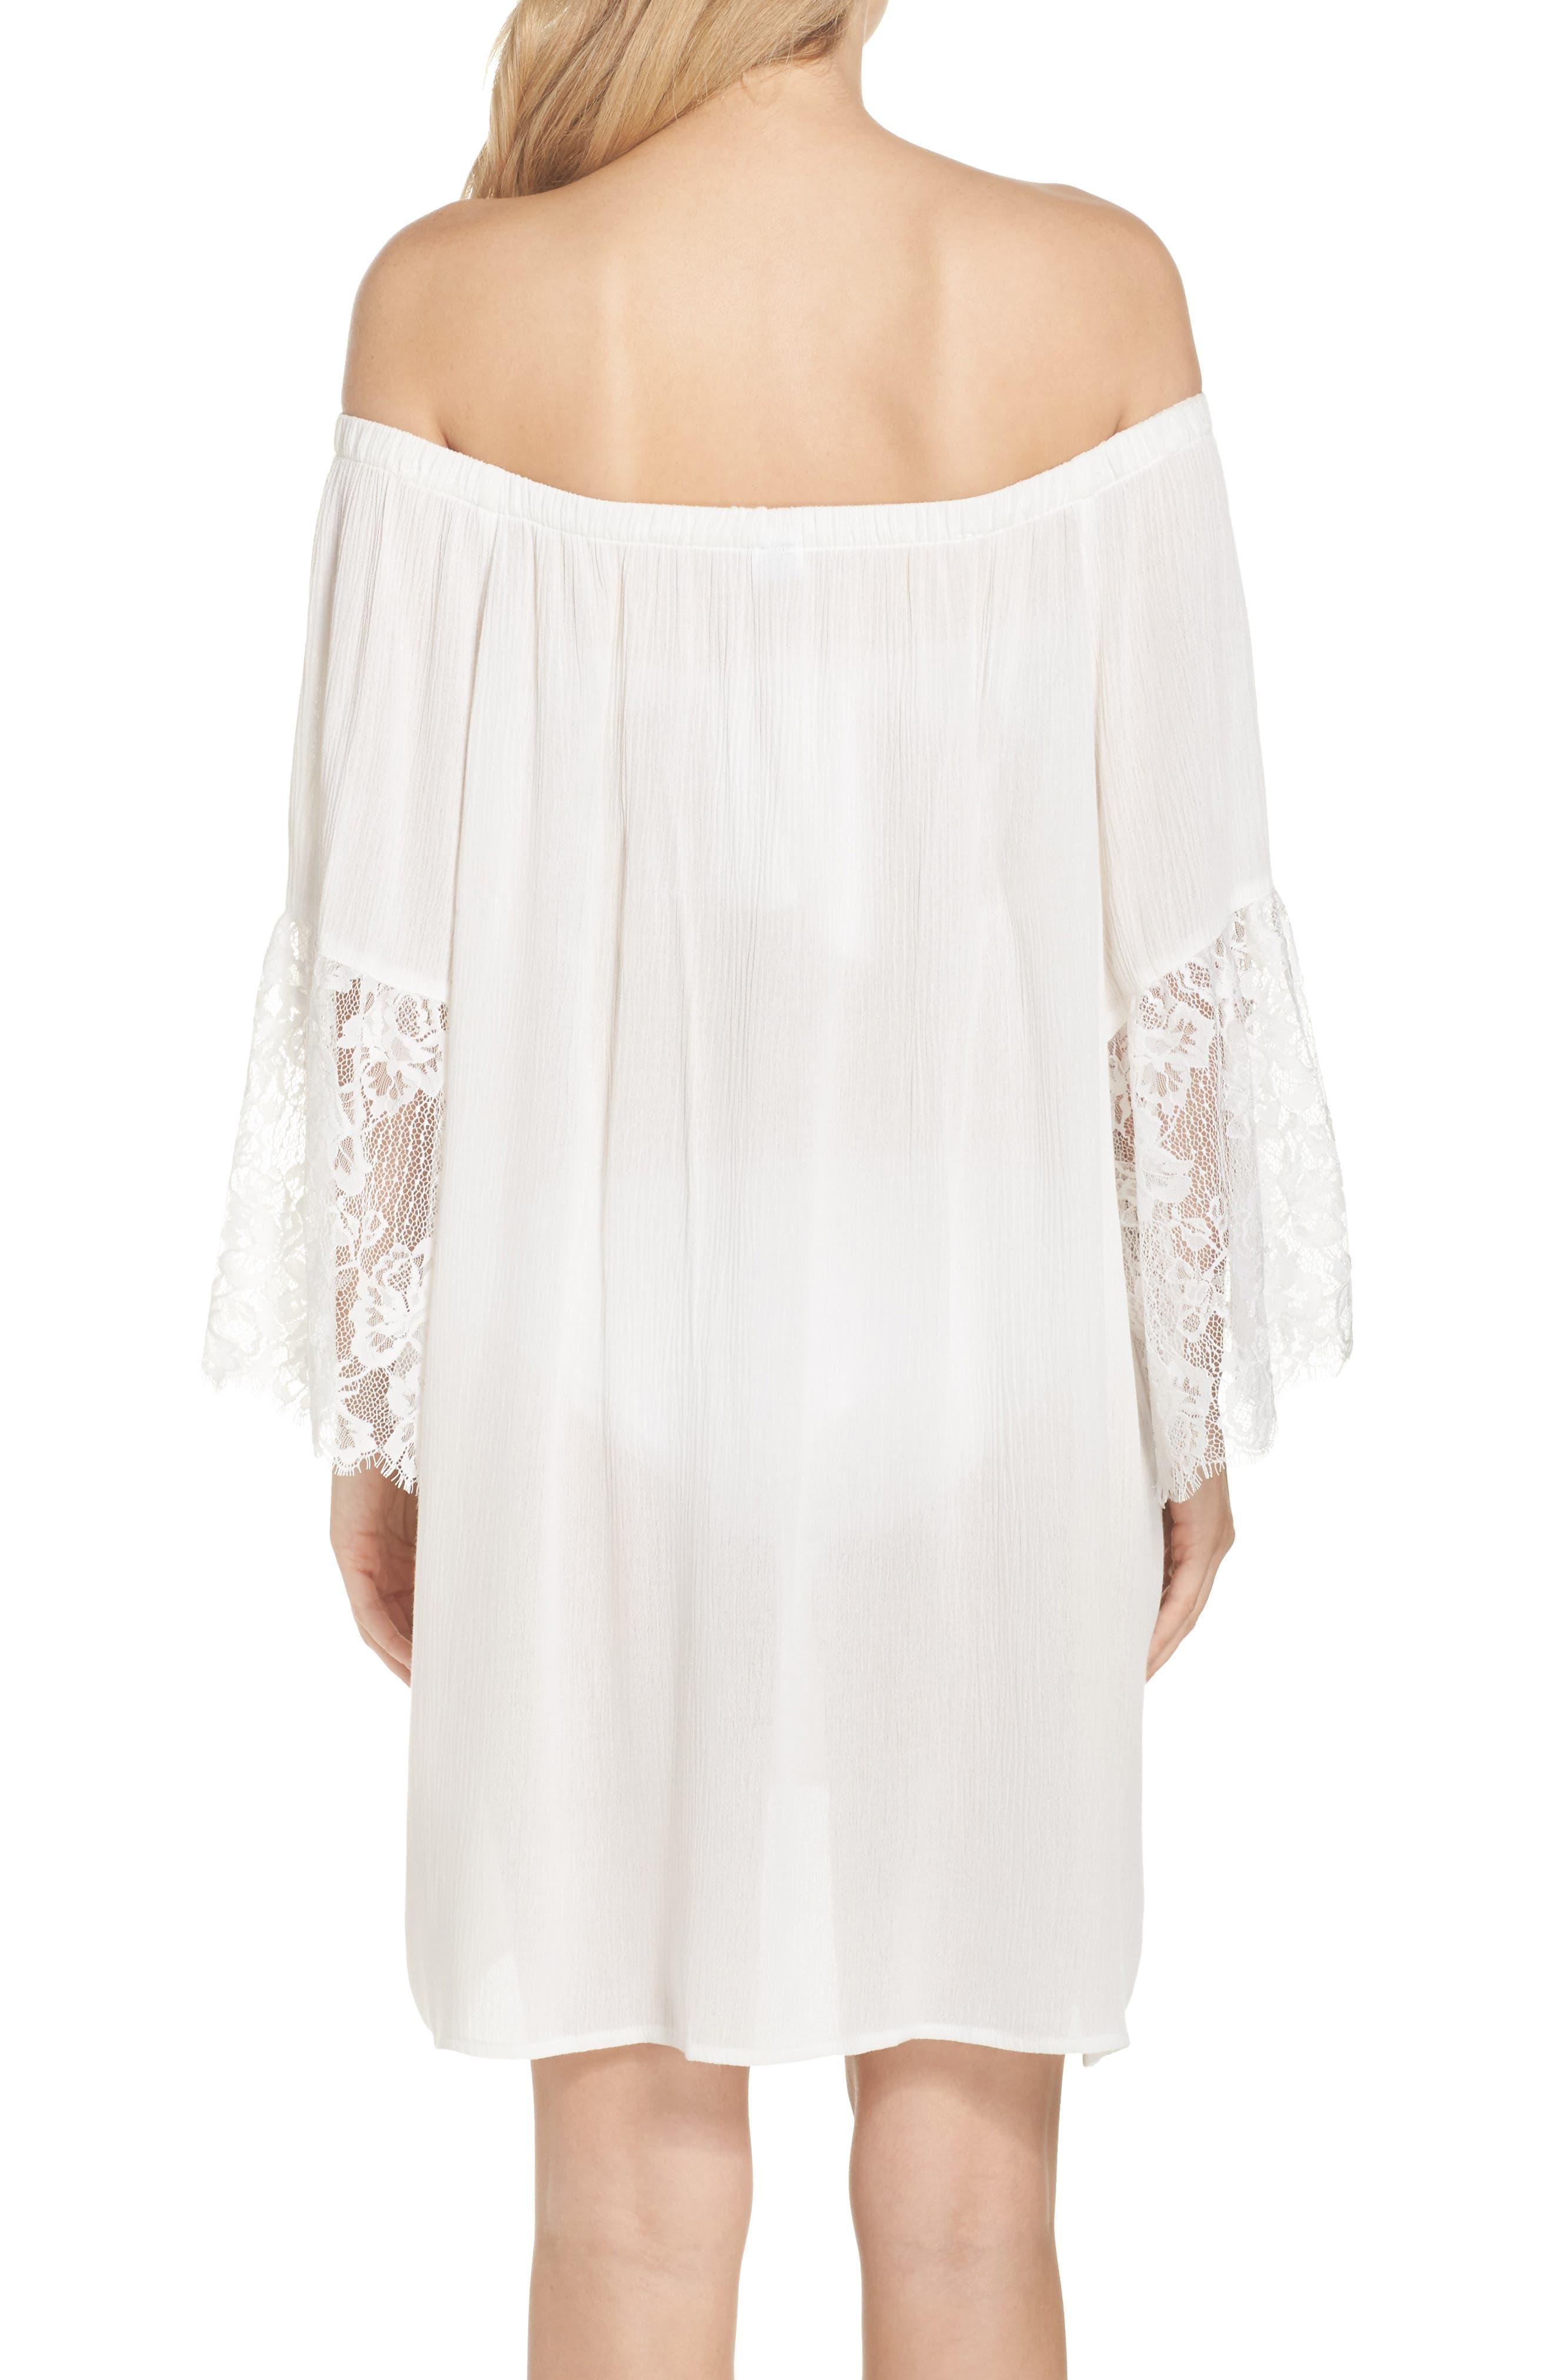 Off the Shoulder Cover-Up Dress,                             Alternate thumbnail 6, color,